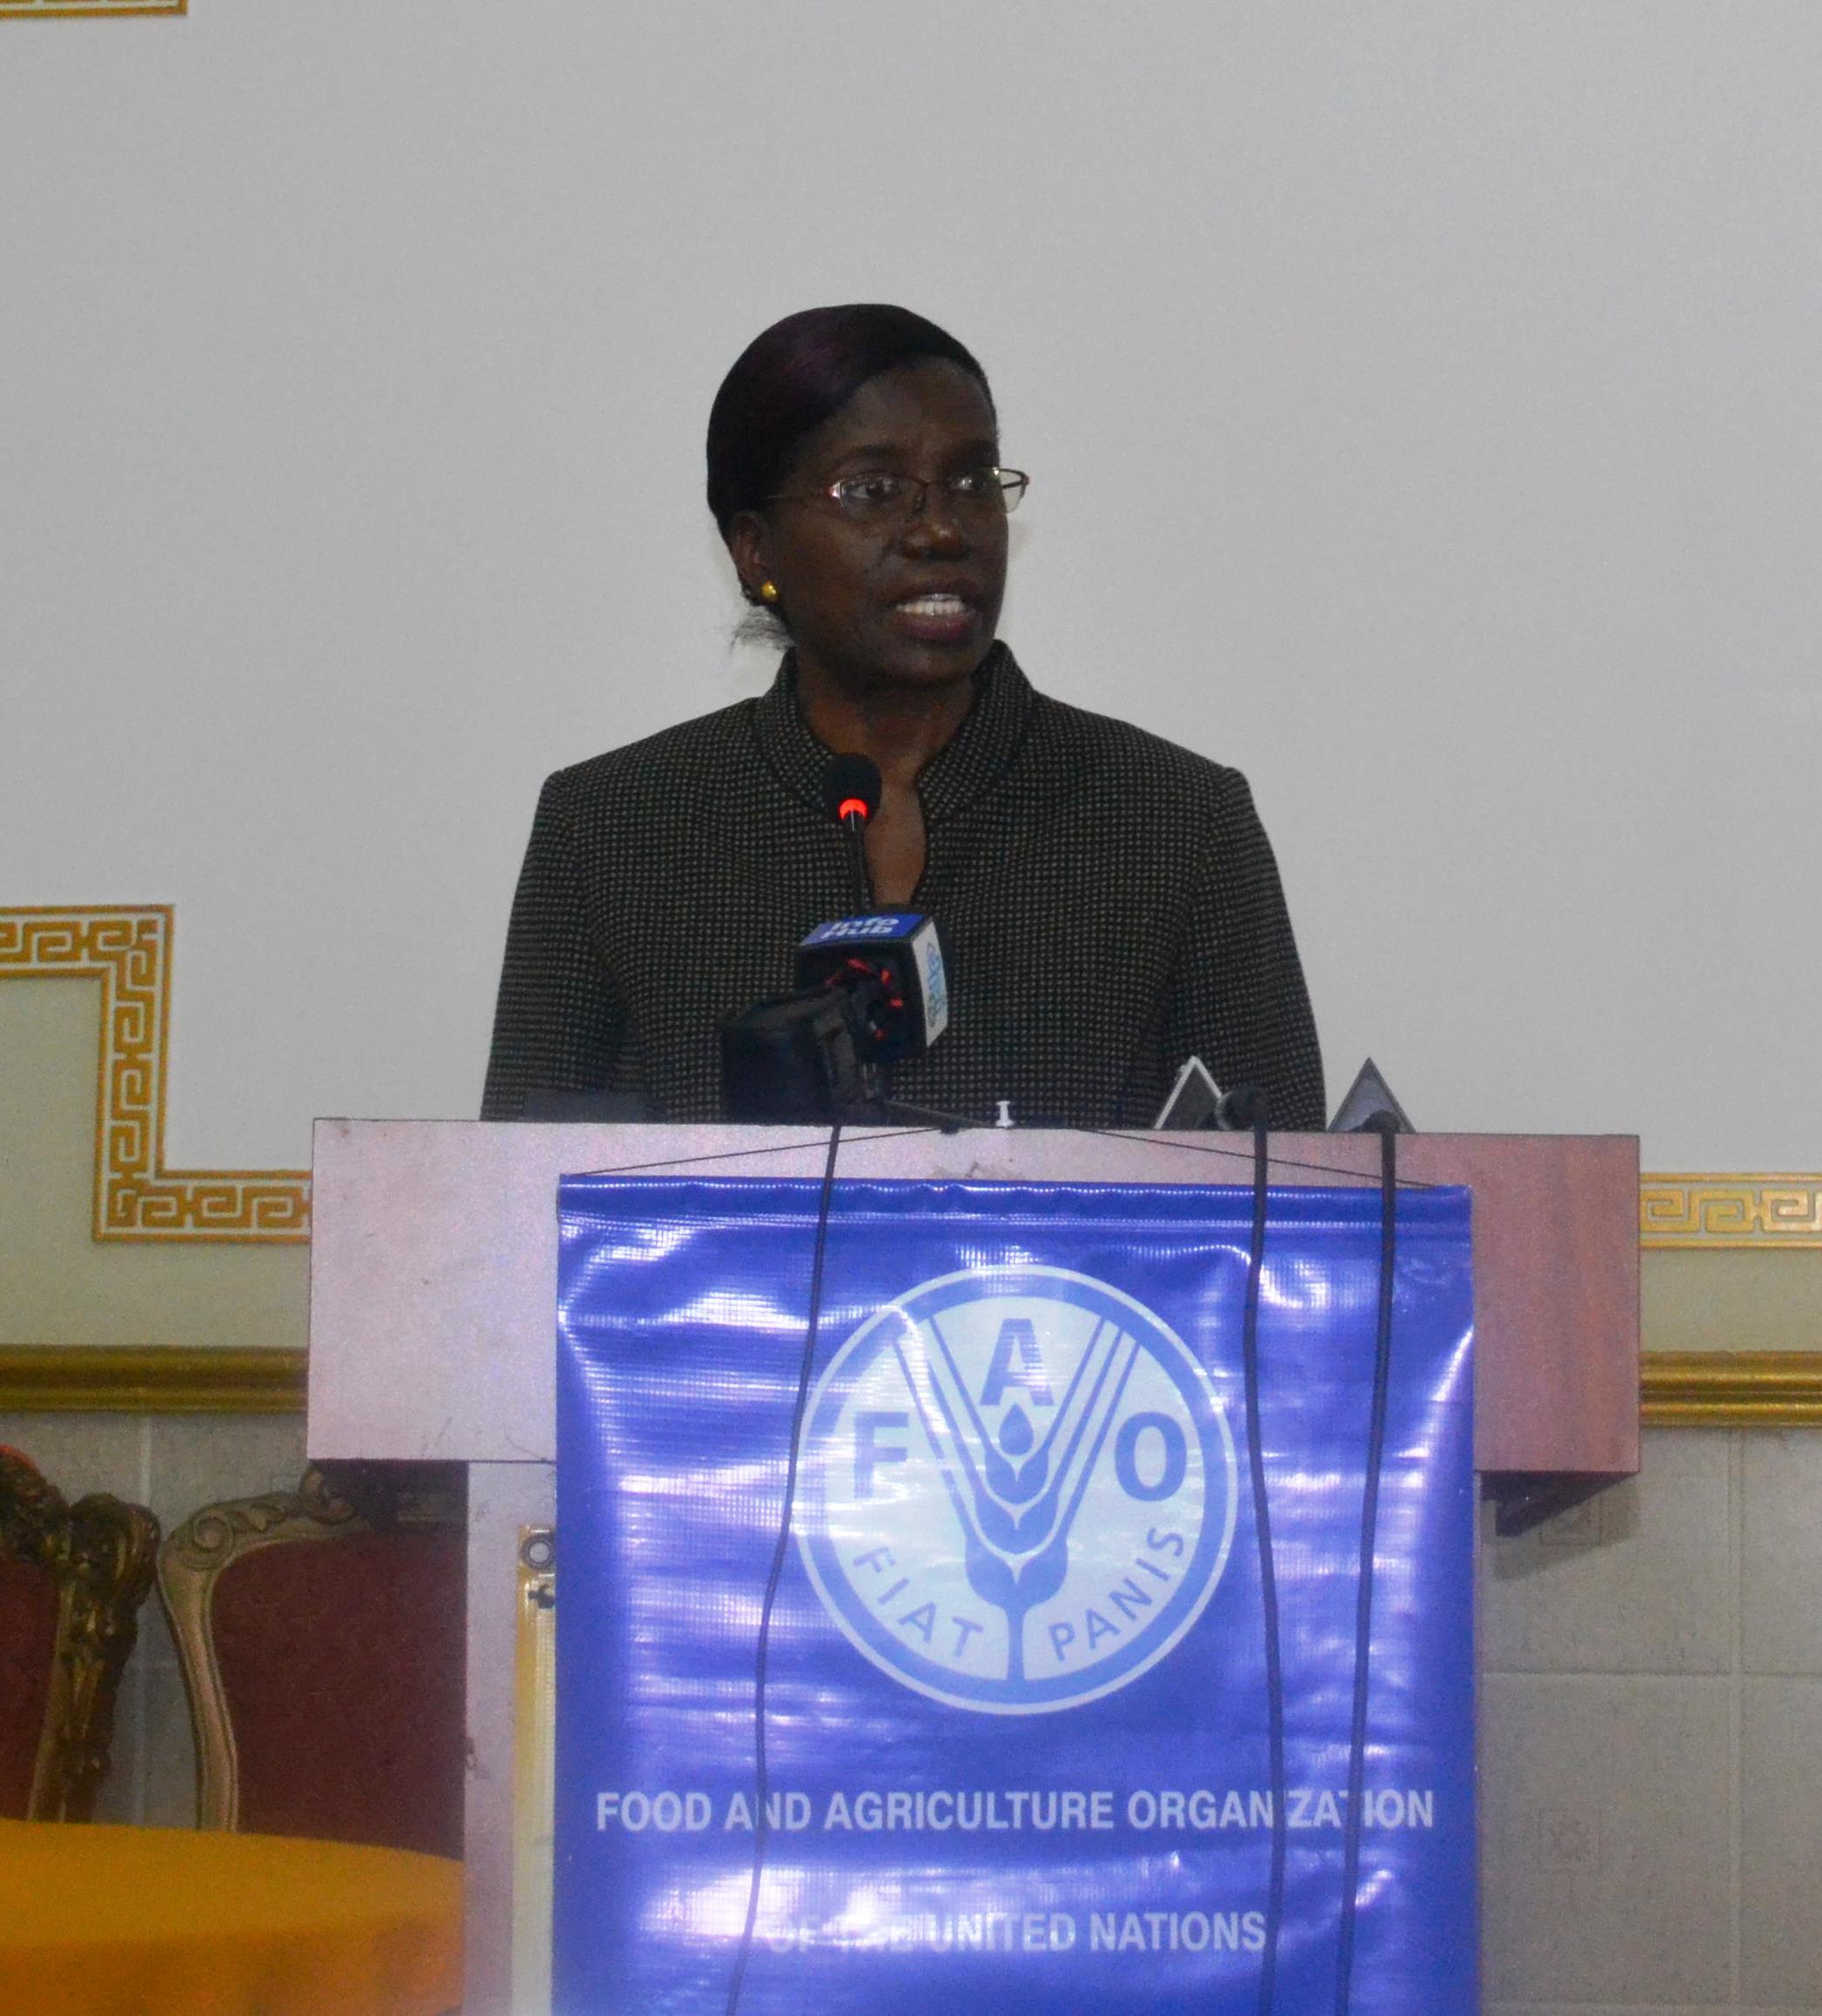 Ms. Delma Nedd, Permanent Secretary, Ministry of Agriculture